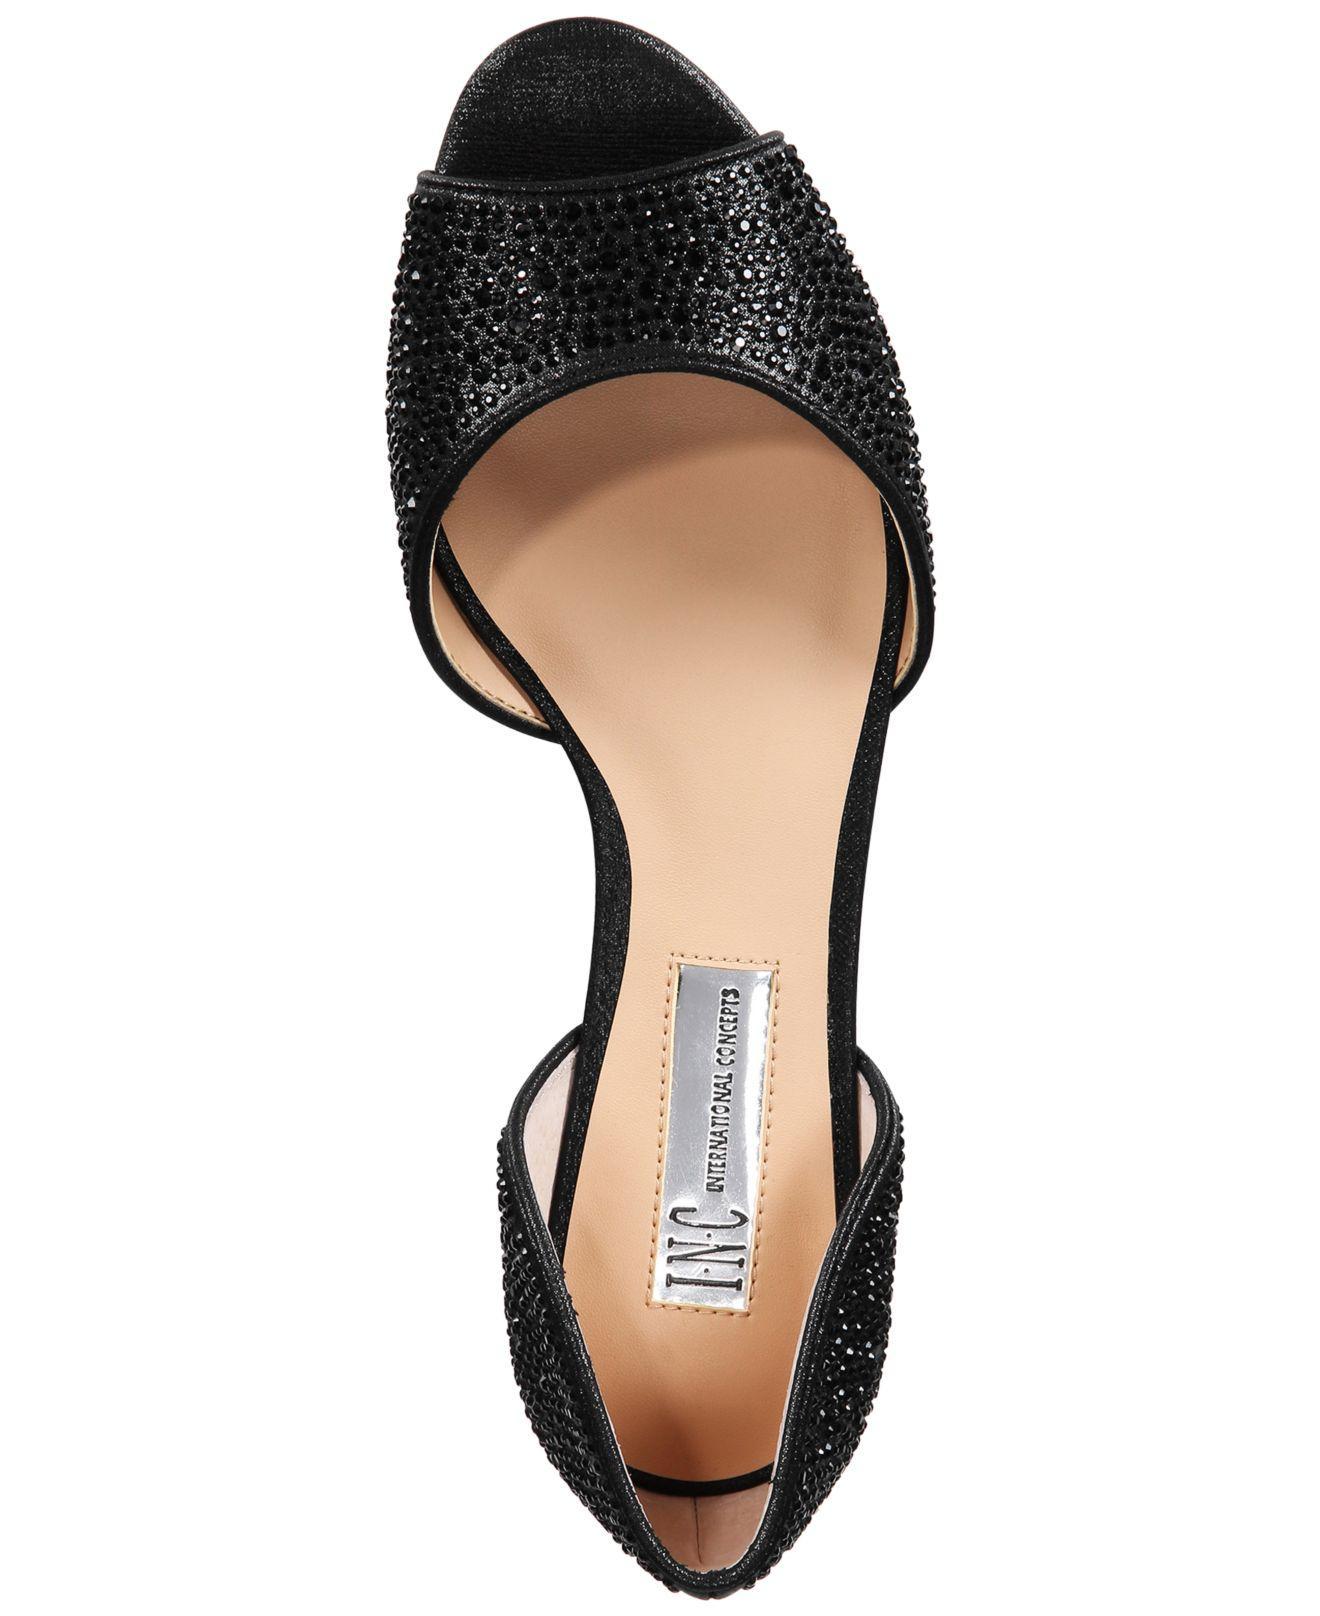 elsah women Inc international concepts inc international concepts womens elsah leather open toe slide flats at blueflycom.